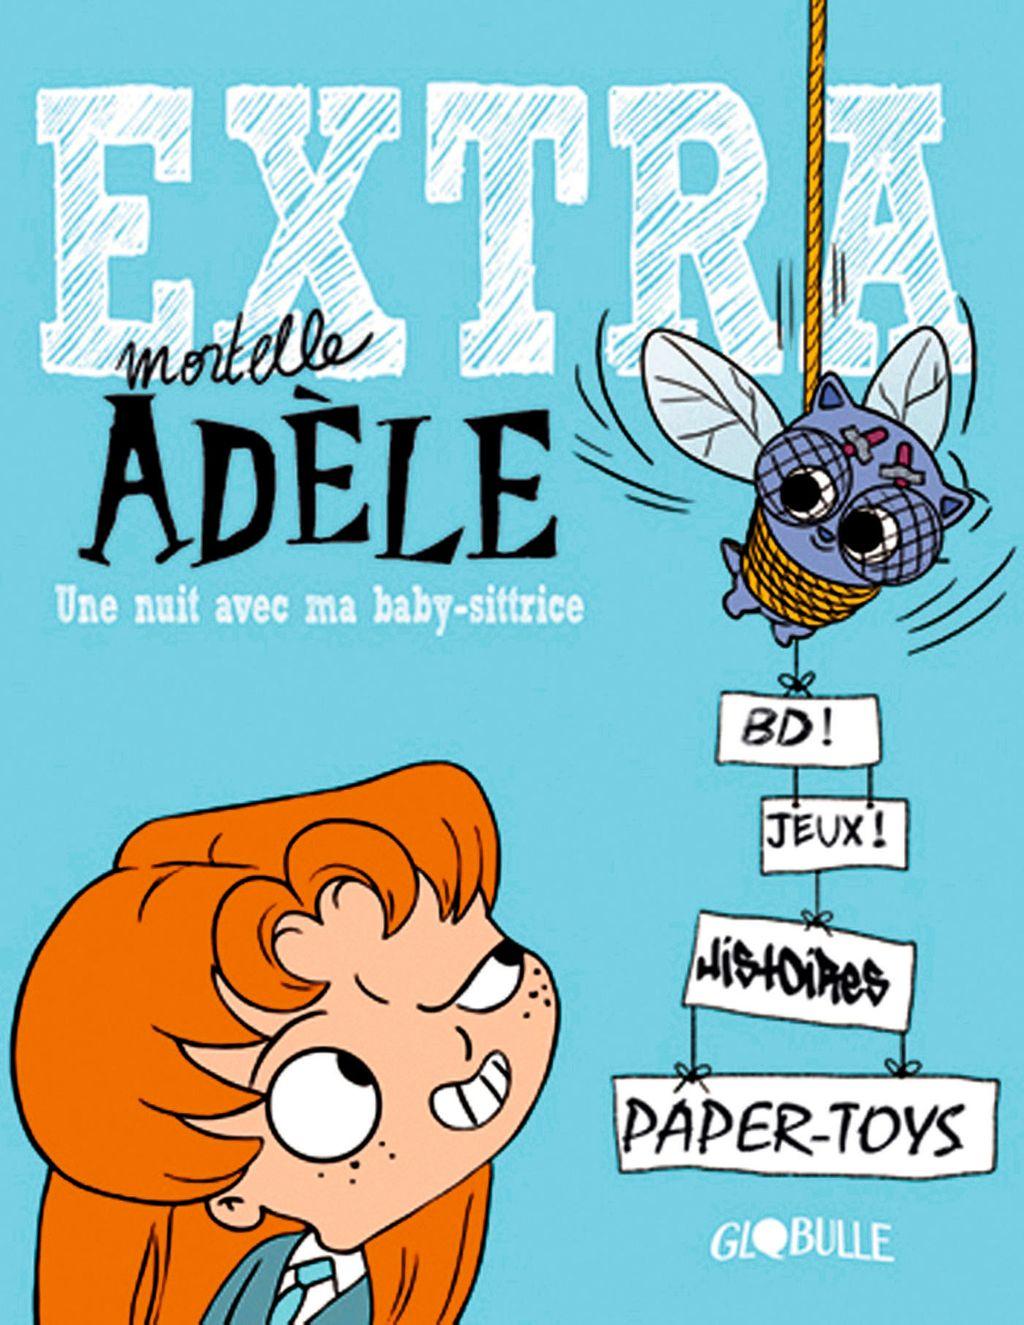 «Extra Mortelle Adèle T1 – Une nuit avec ma baby sittrice» cover